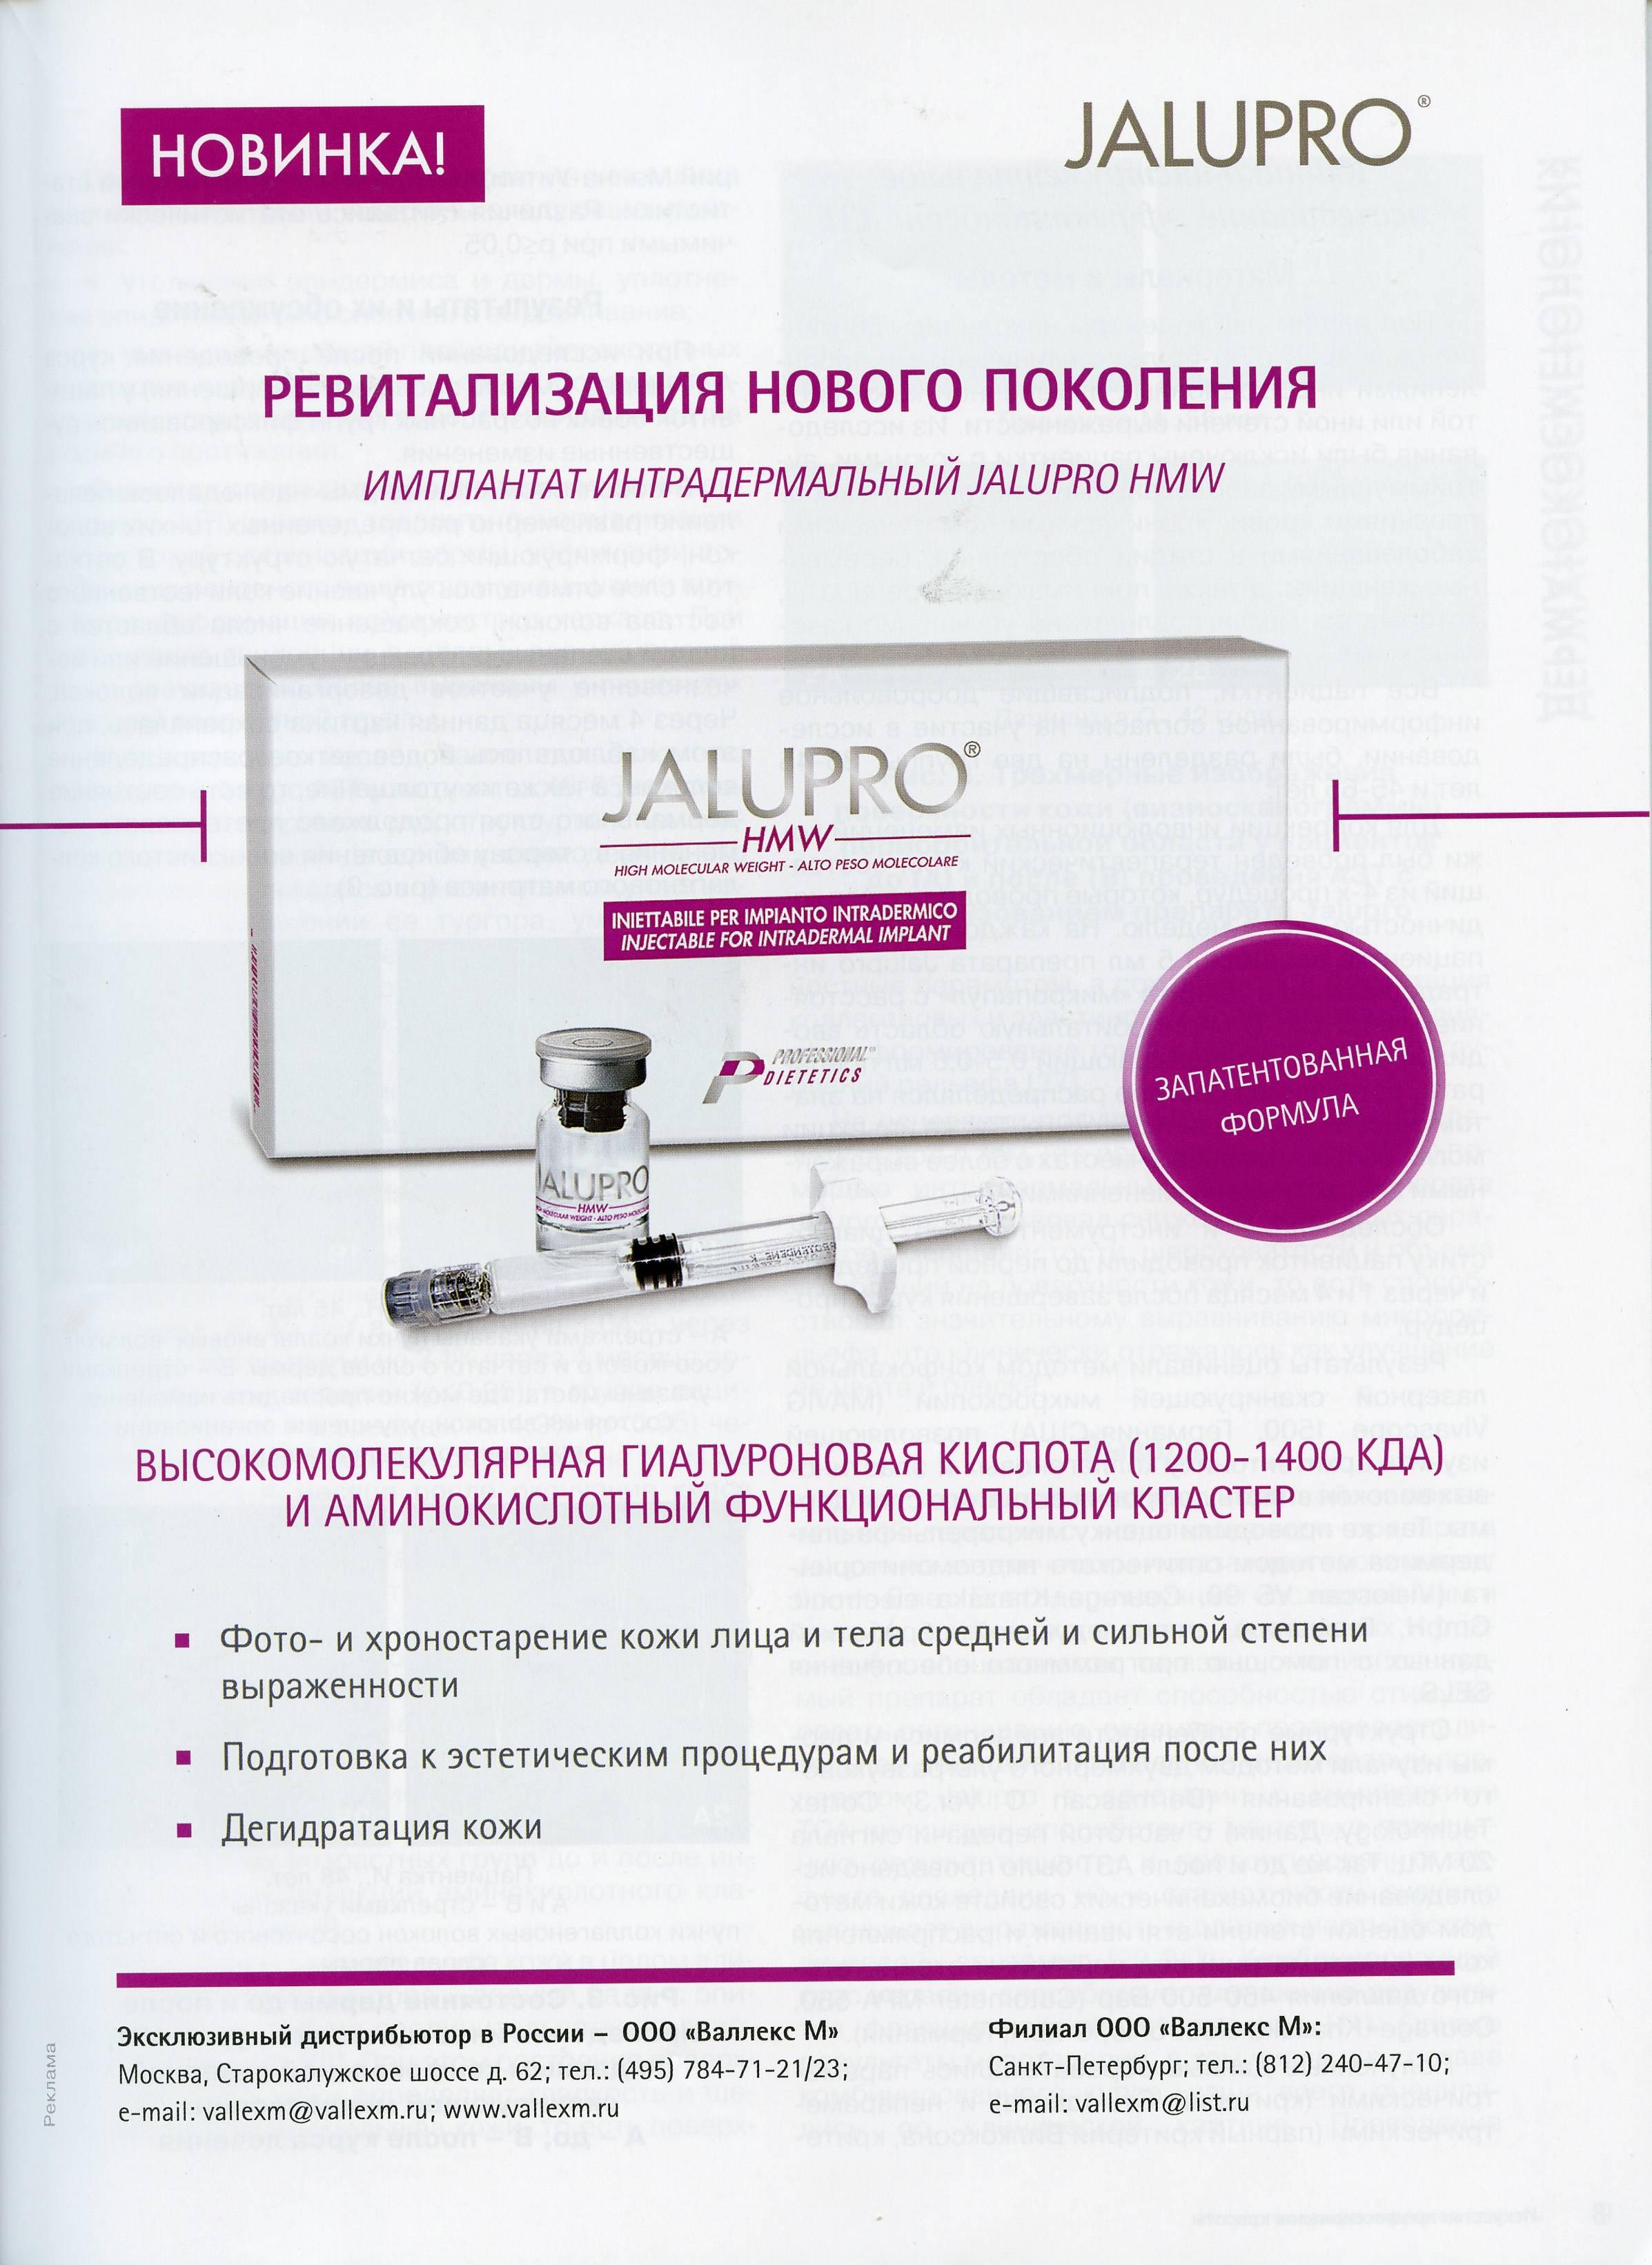 «ялупро» биоревитализация – особенности и состав препарата jalupro, инструкция по применению